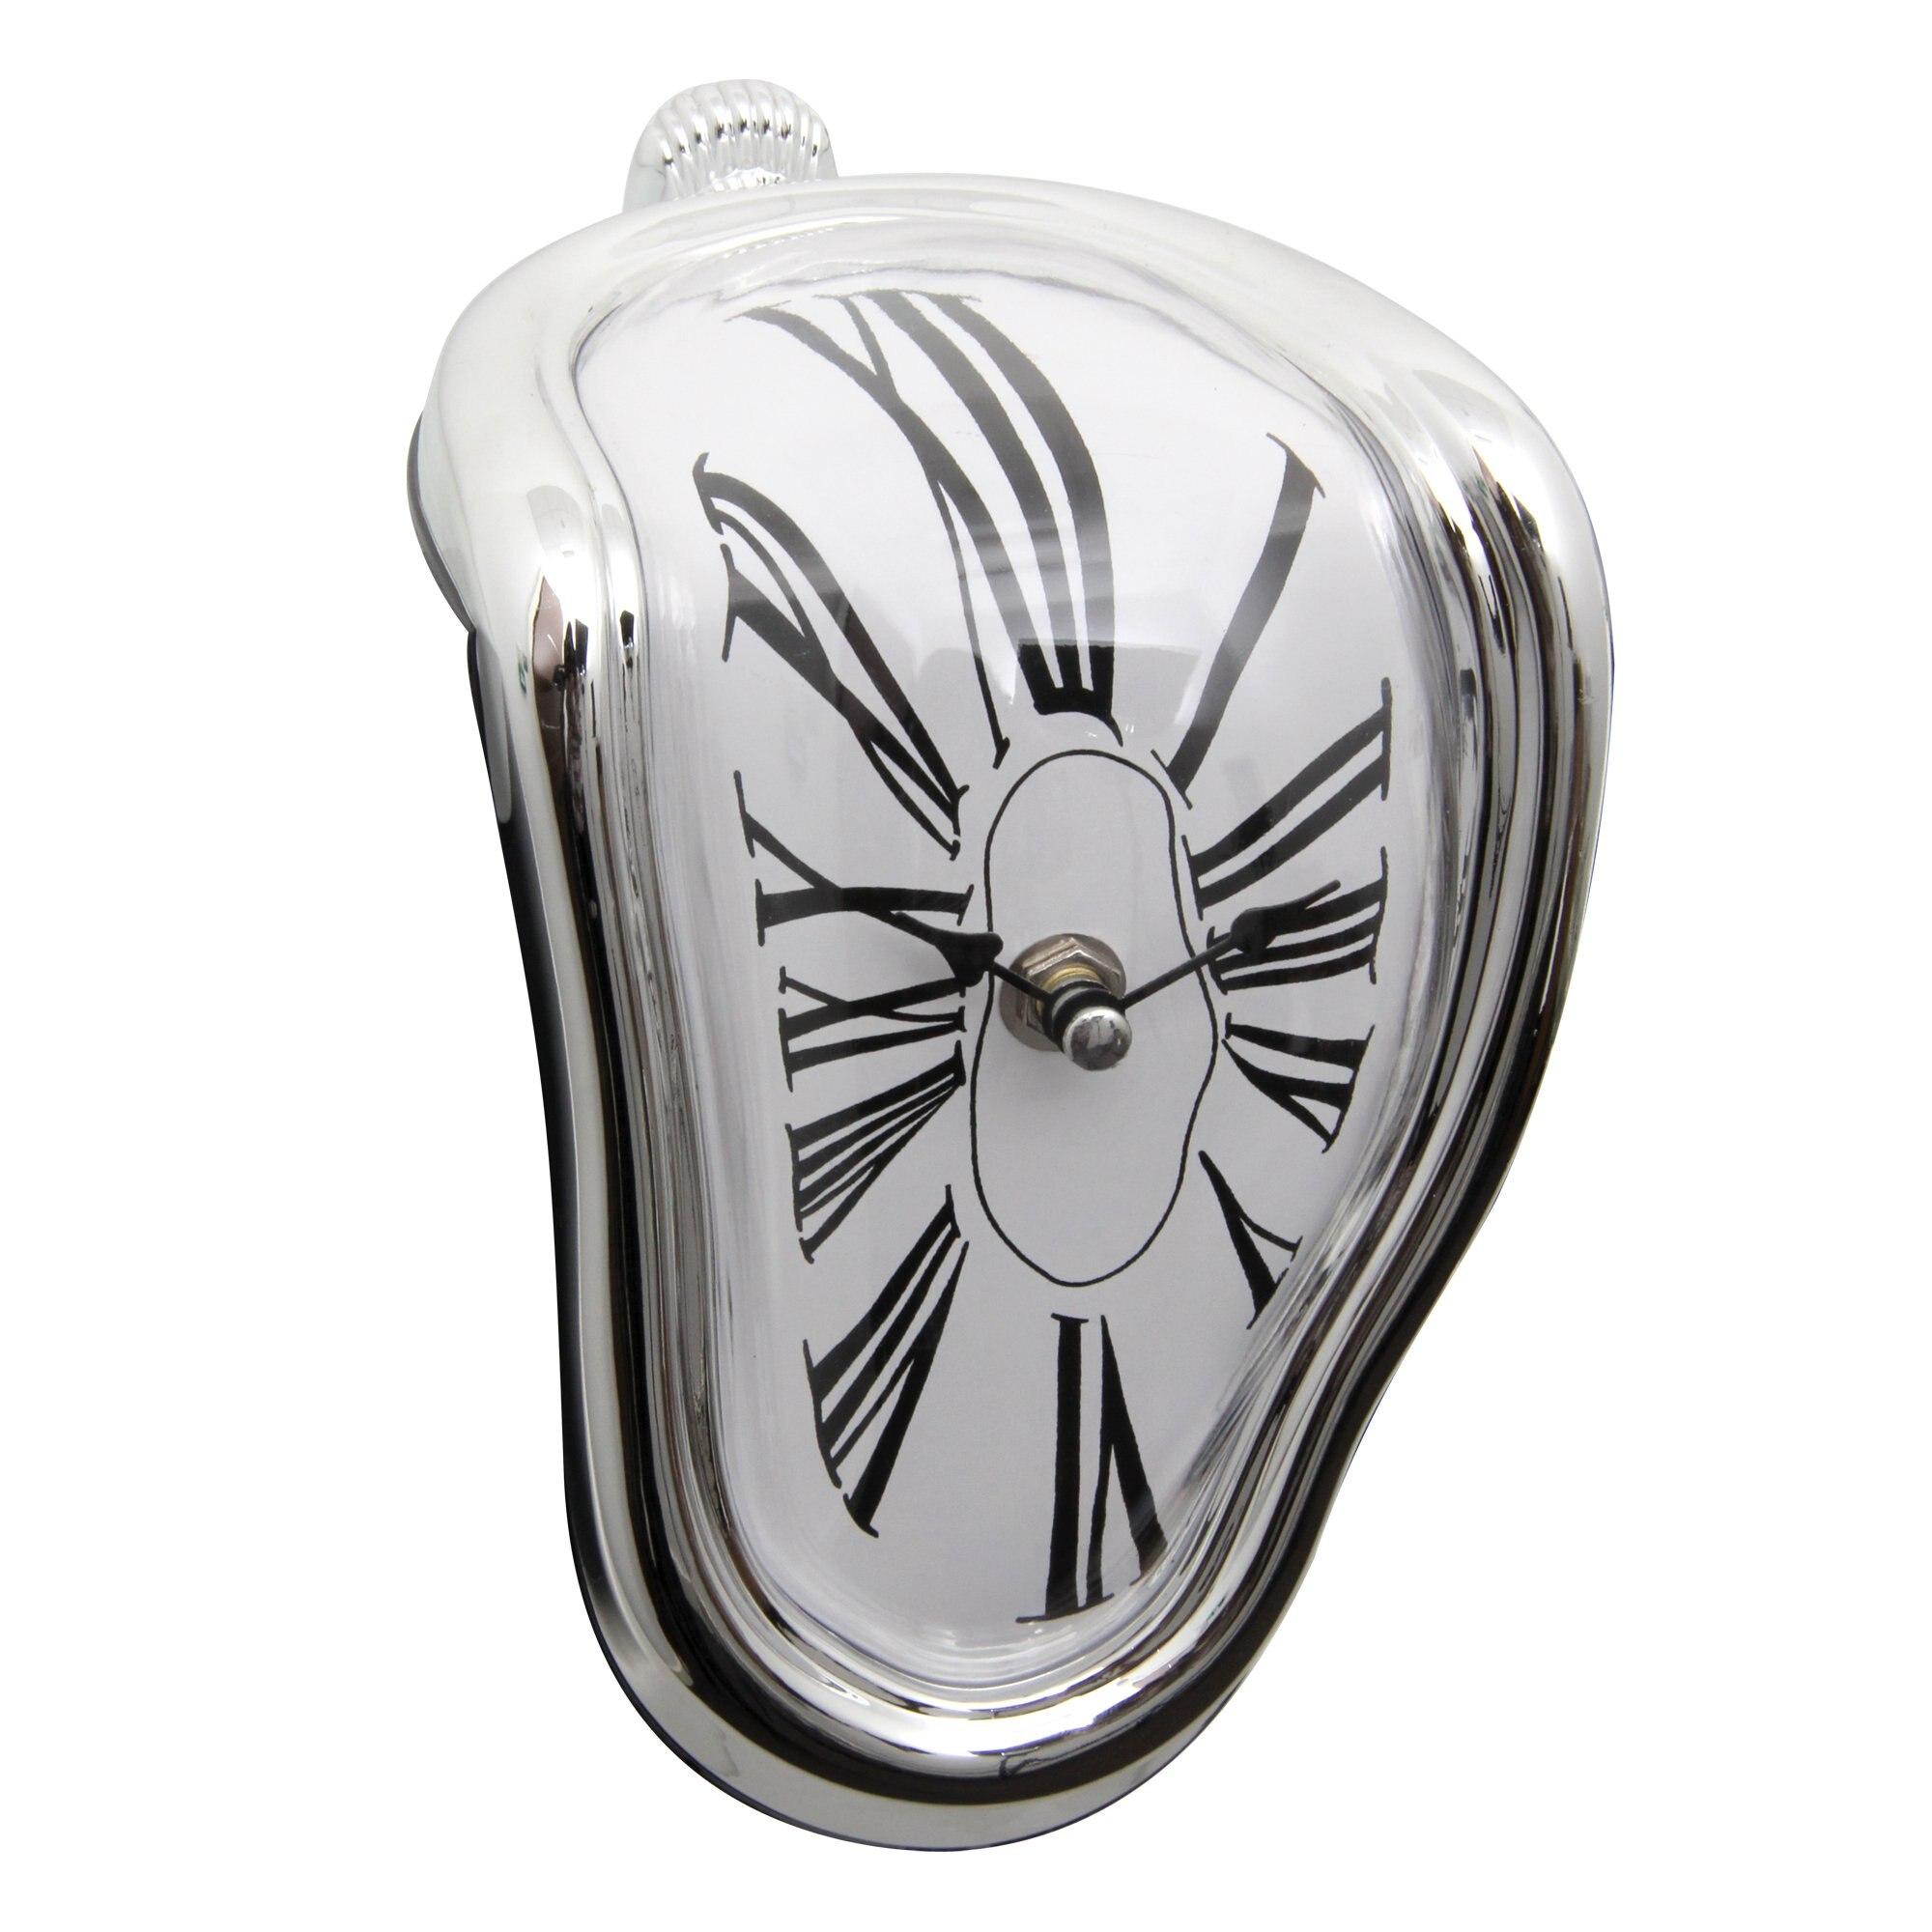 Horloge fondante 1